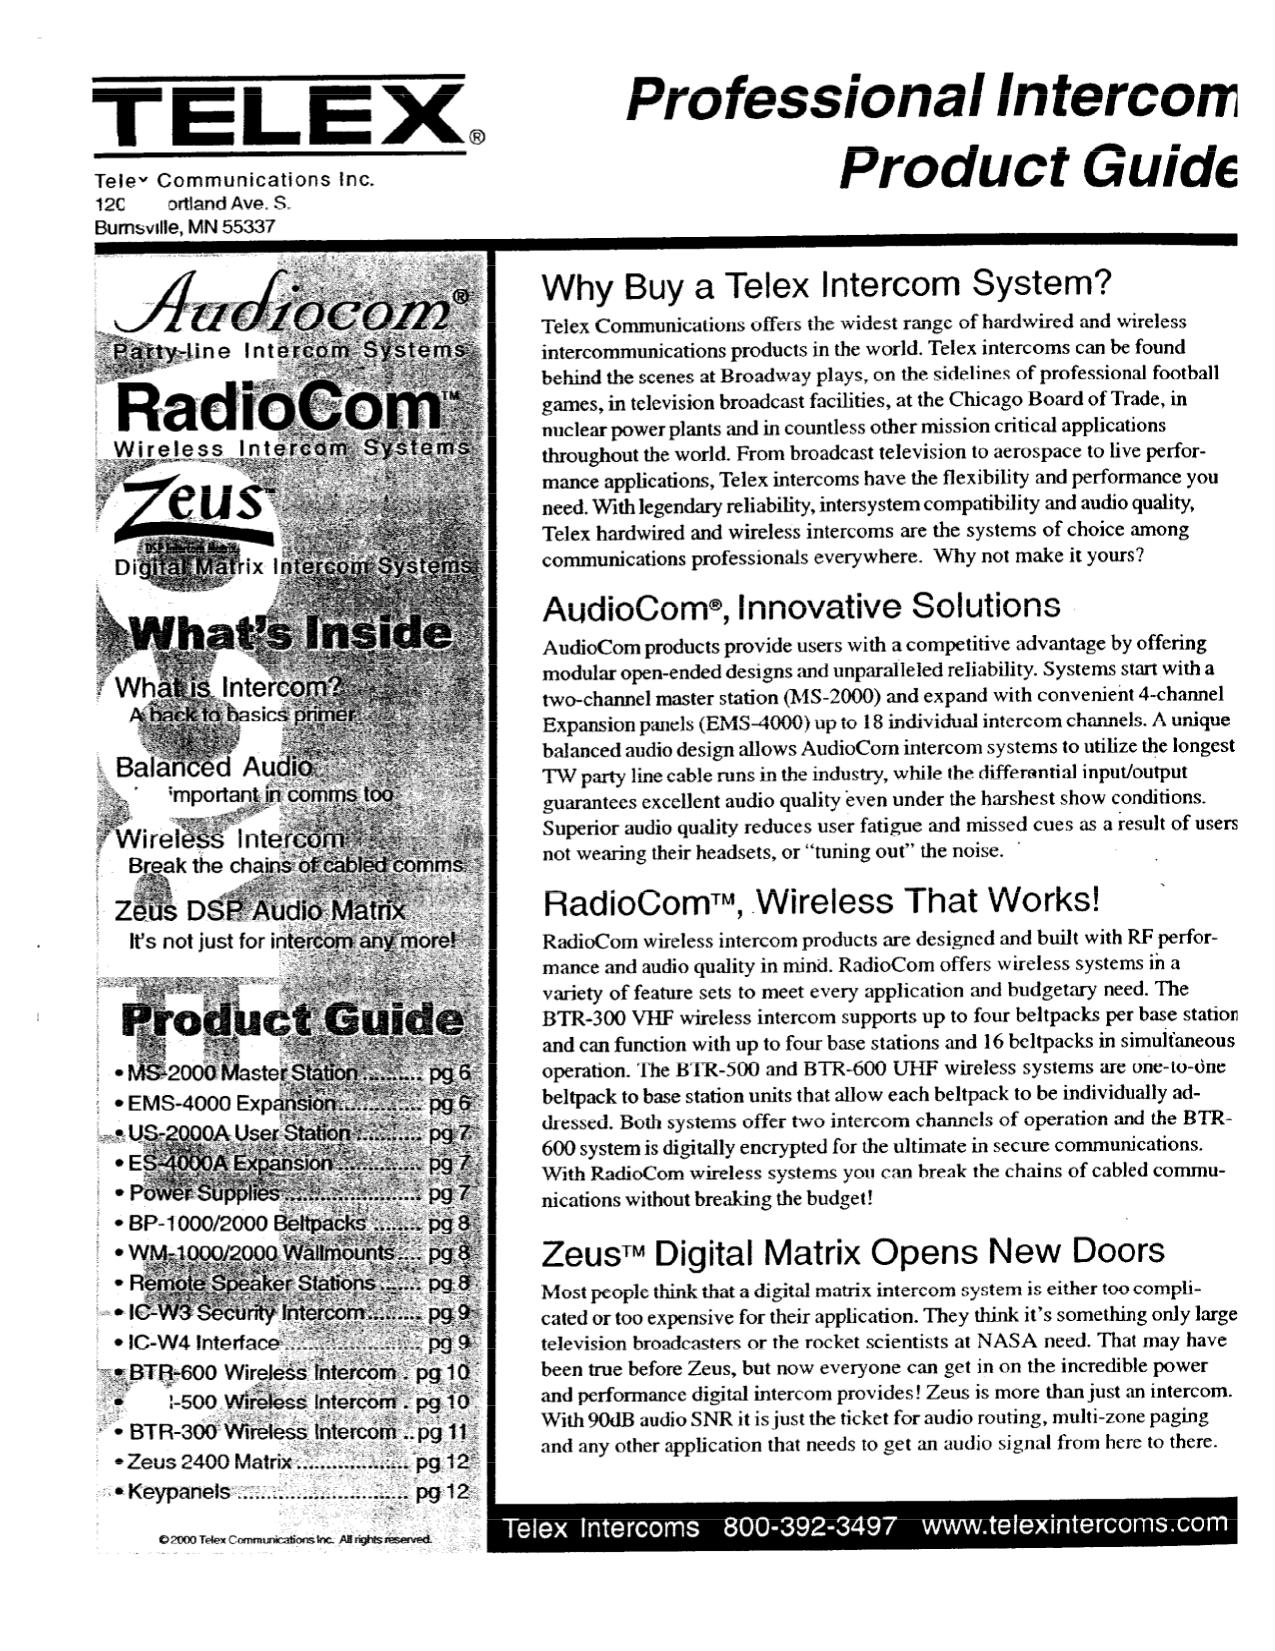 Tremendous Download Free Pdf For Telex Btr 300 Intercom System Other Manual Wiring 101 Olytiaxxcnl